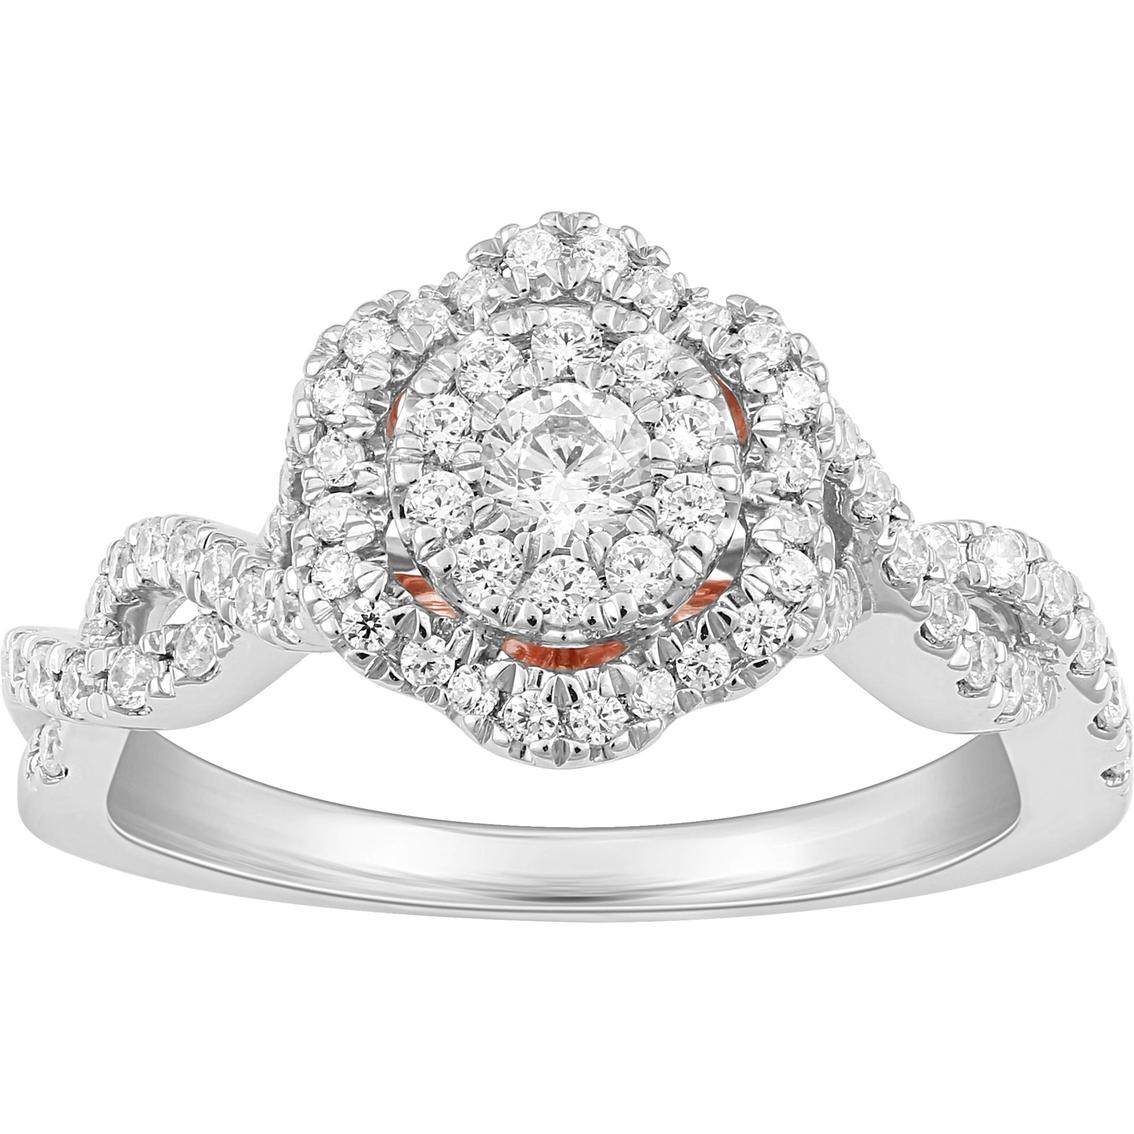 61fb4d28ef872 Disney Enchanted 14k White And Rose Gold 5/8 Ctw Diamond Belle Rose ...